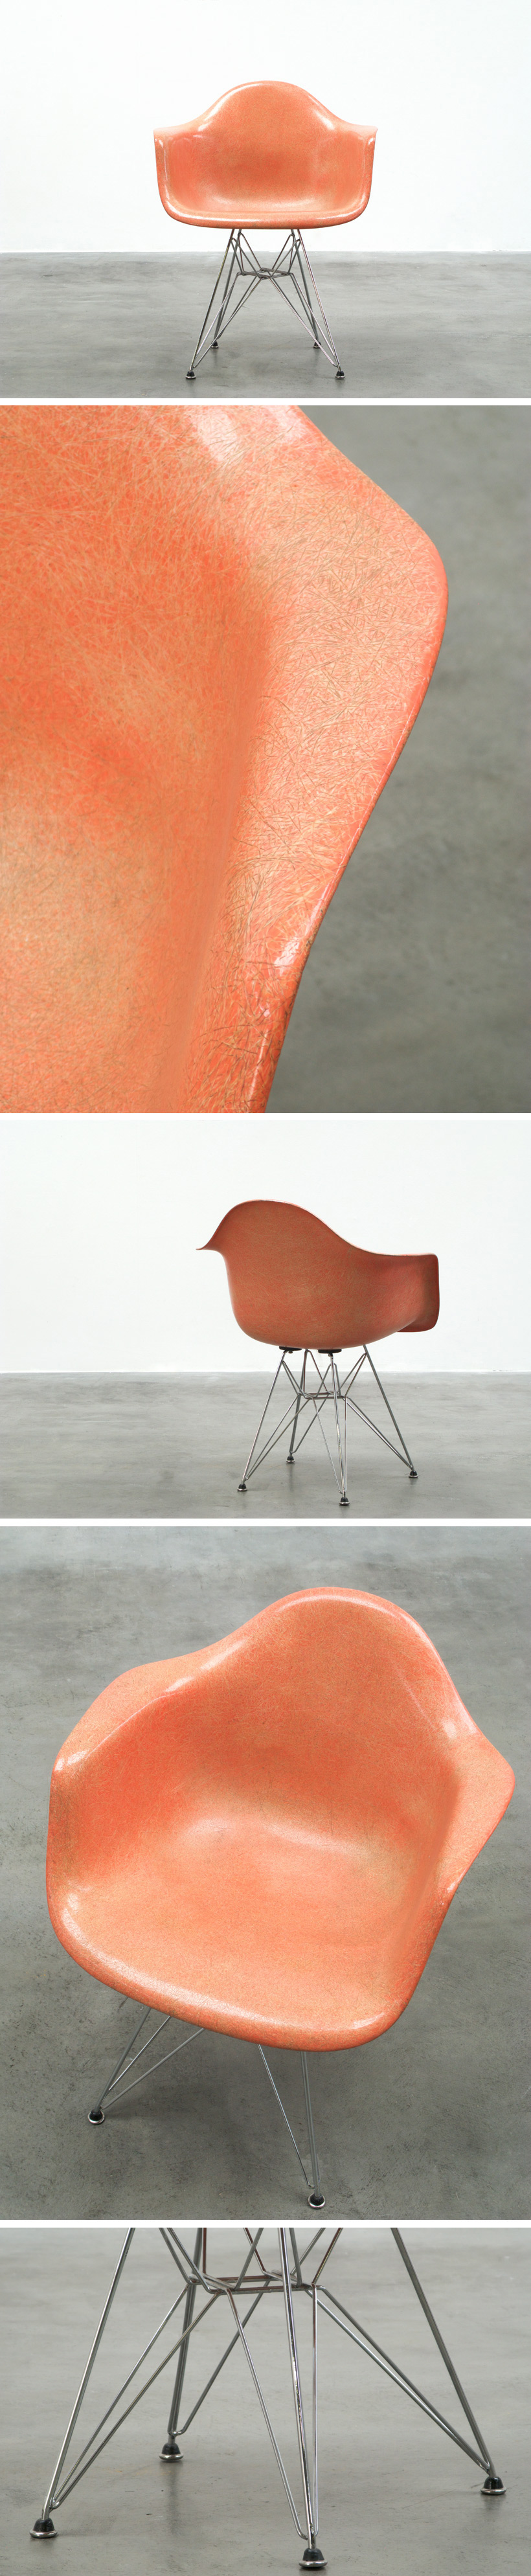 Zenith Charles Eames DAR fiberglass shell chair Large